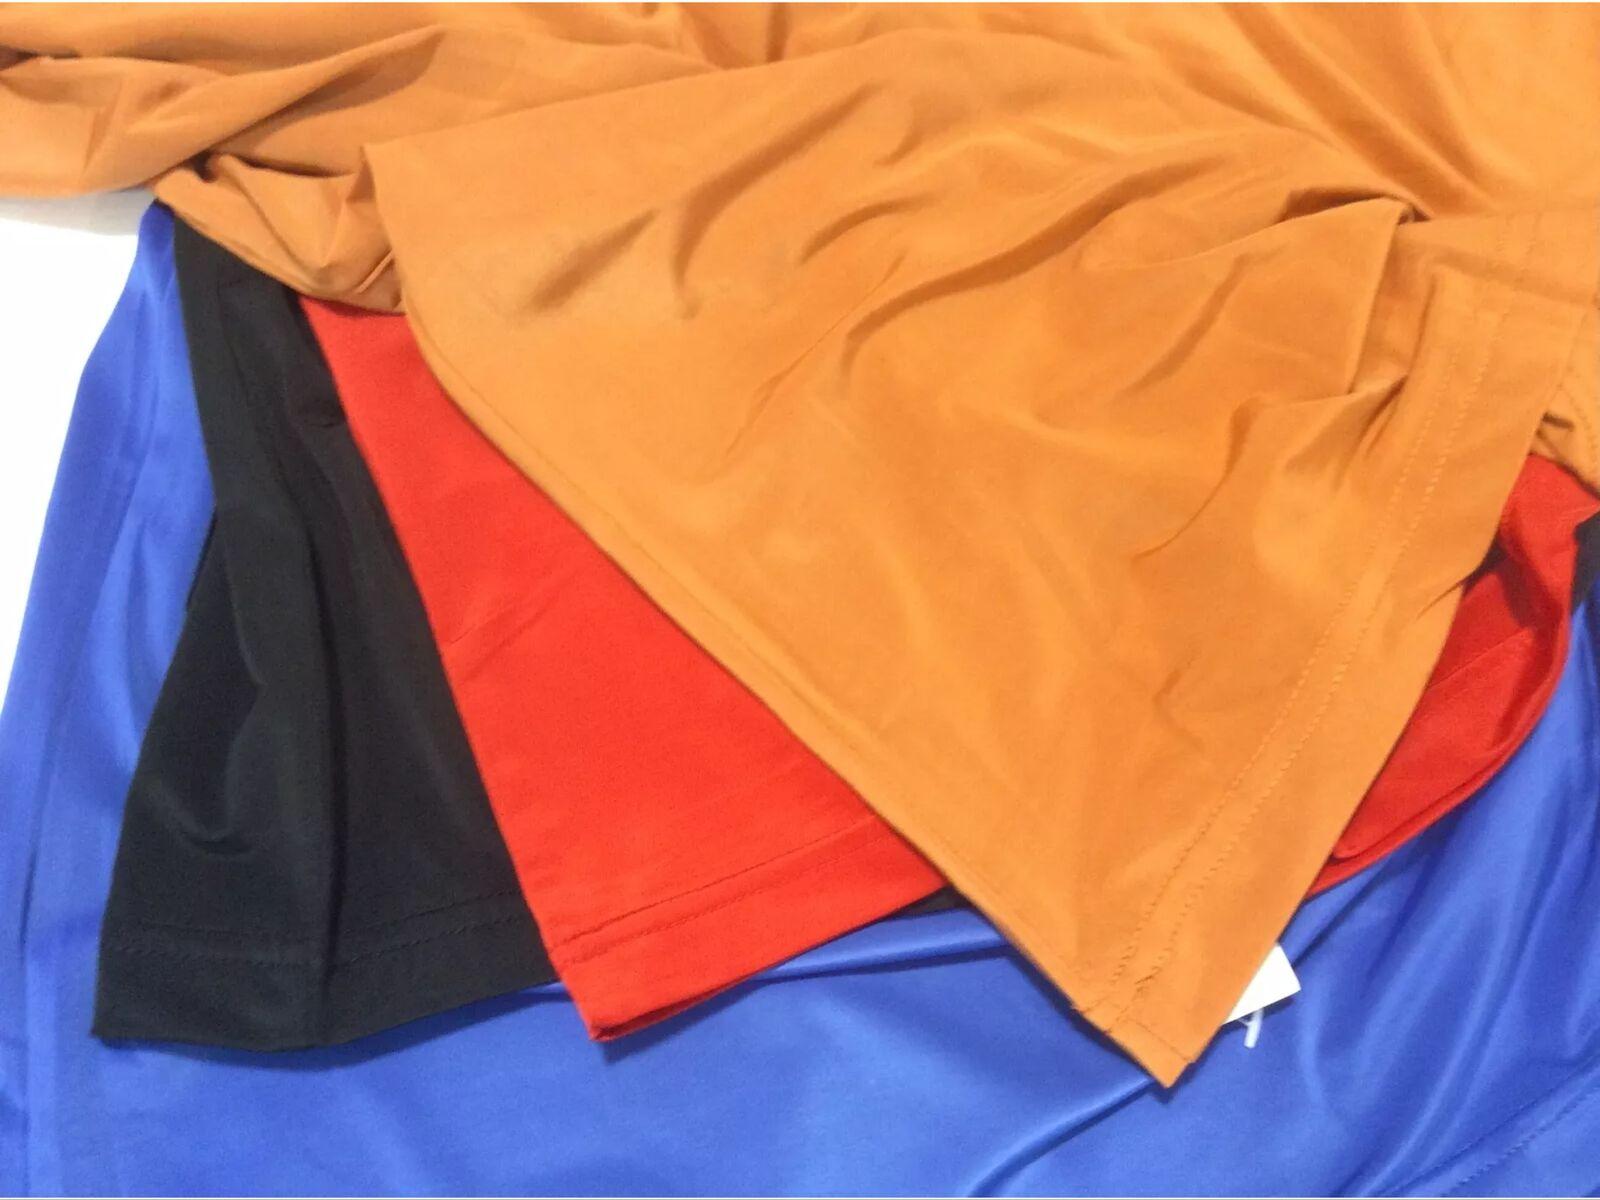 Stacy Adams Big Sizes Boxer Shorts Moisture Wicking Underwear S-4XL SA1000,1002